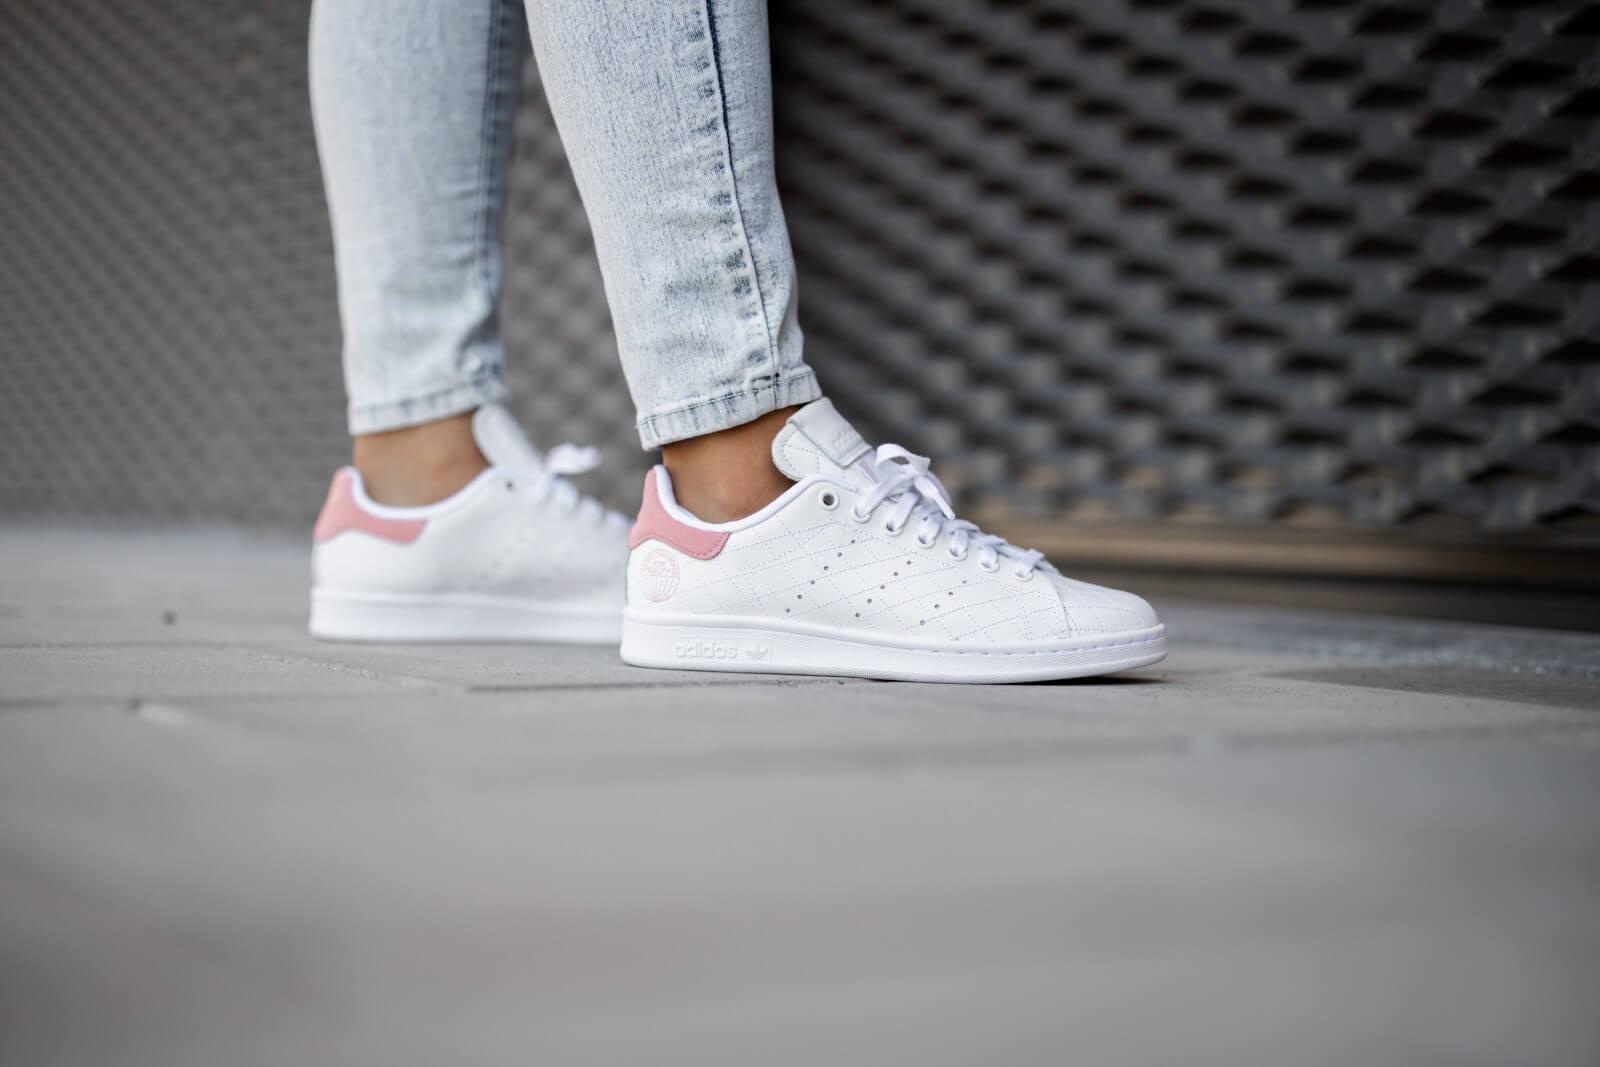 Adidas Women's Stan Smith Footwear White/Glow Pink